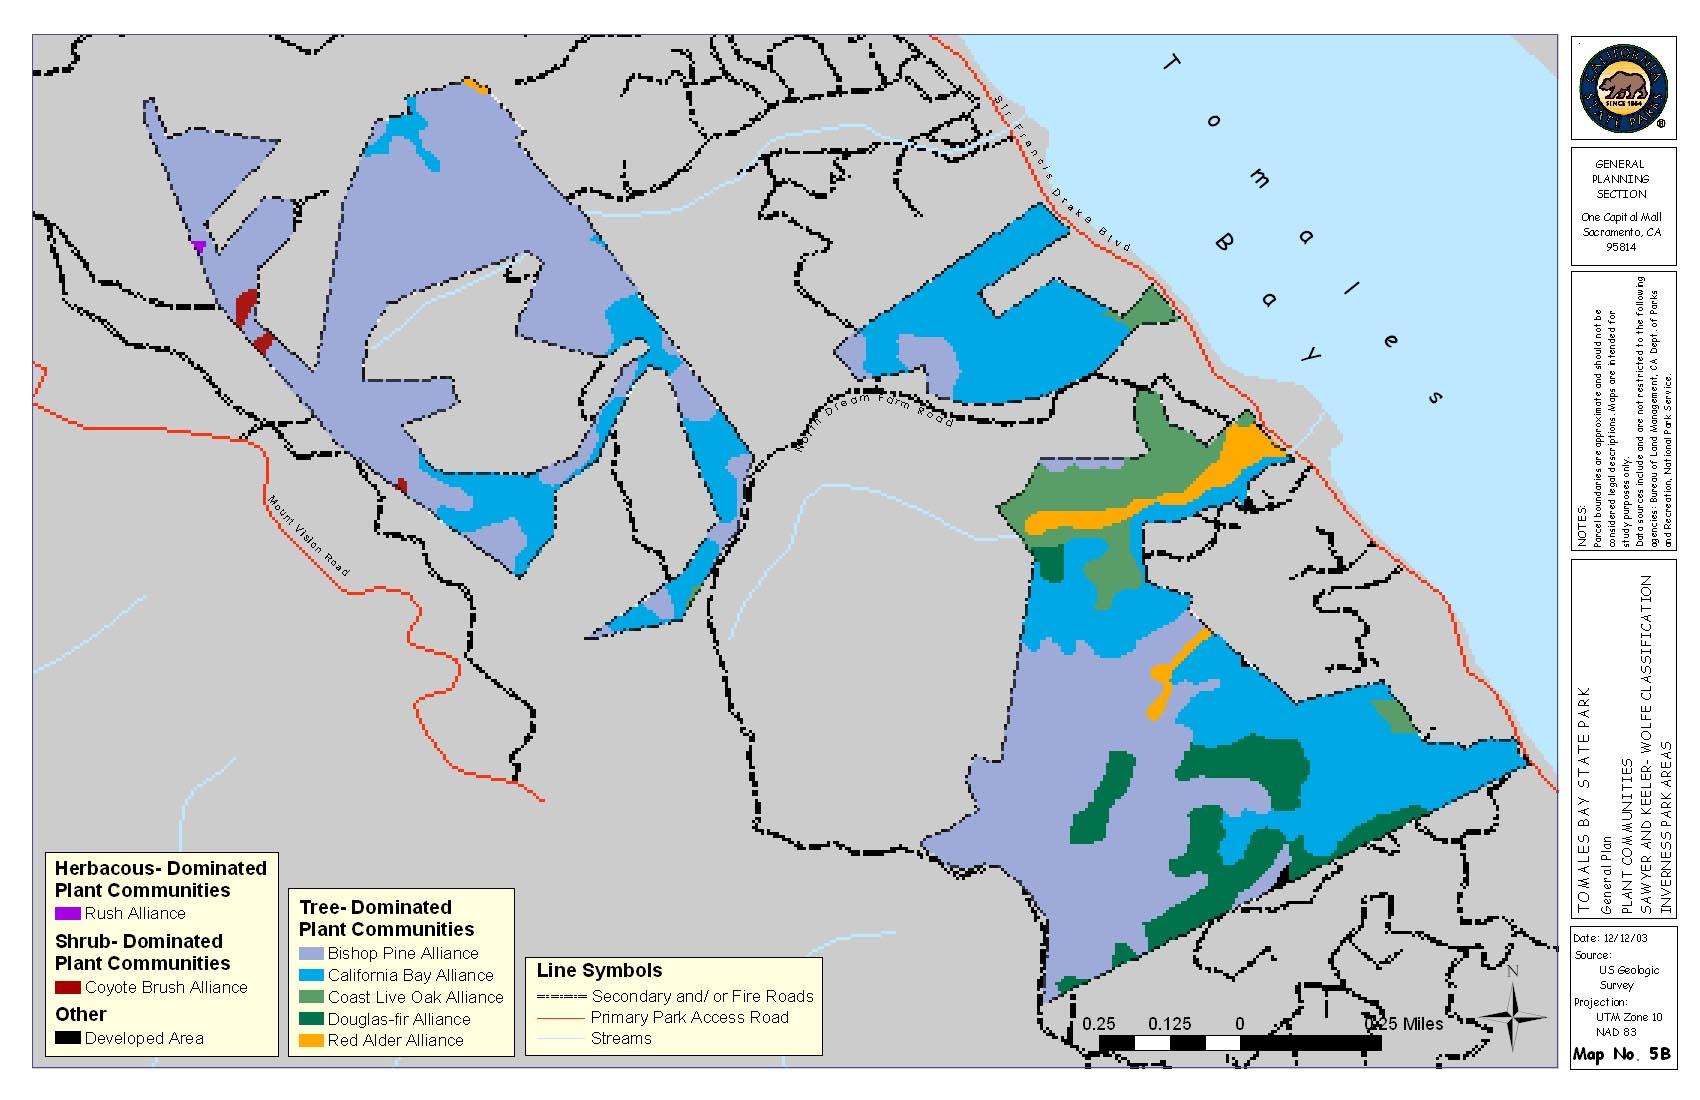 Map1 Regional Map Jpg Map2 Park Planning Areas Jpg Map3a Park Facilities North Jpg Map3b Park Facilities South Jpg Map4a Geologic Hazards North Jpg